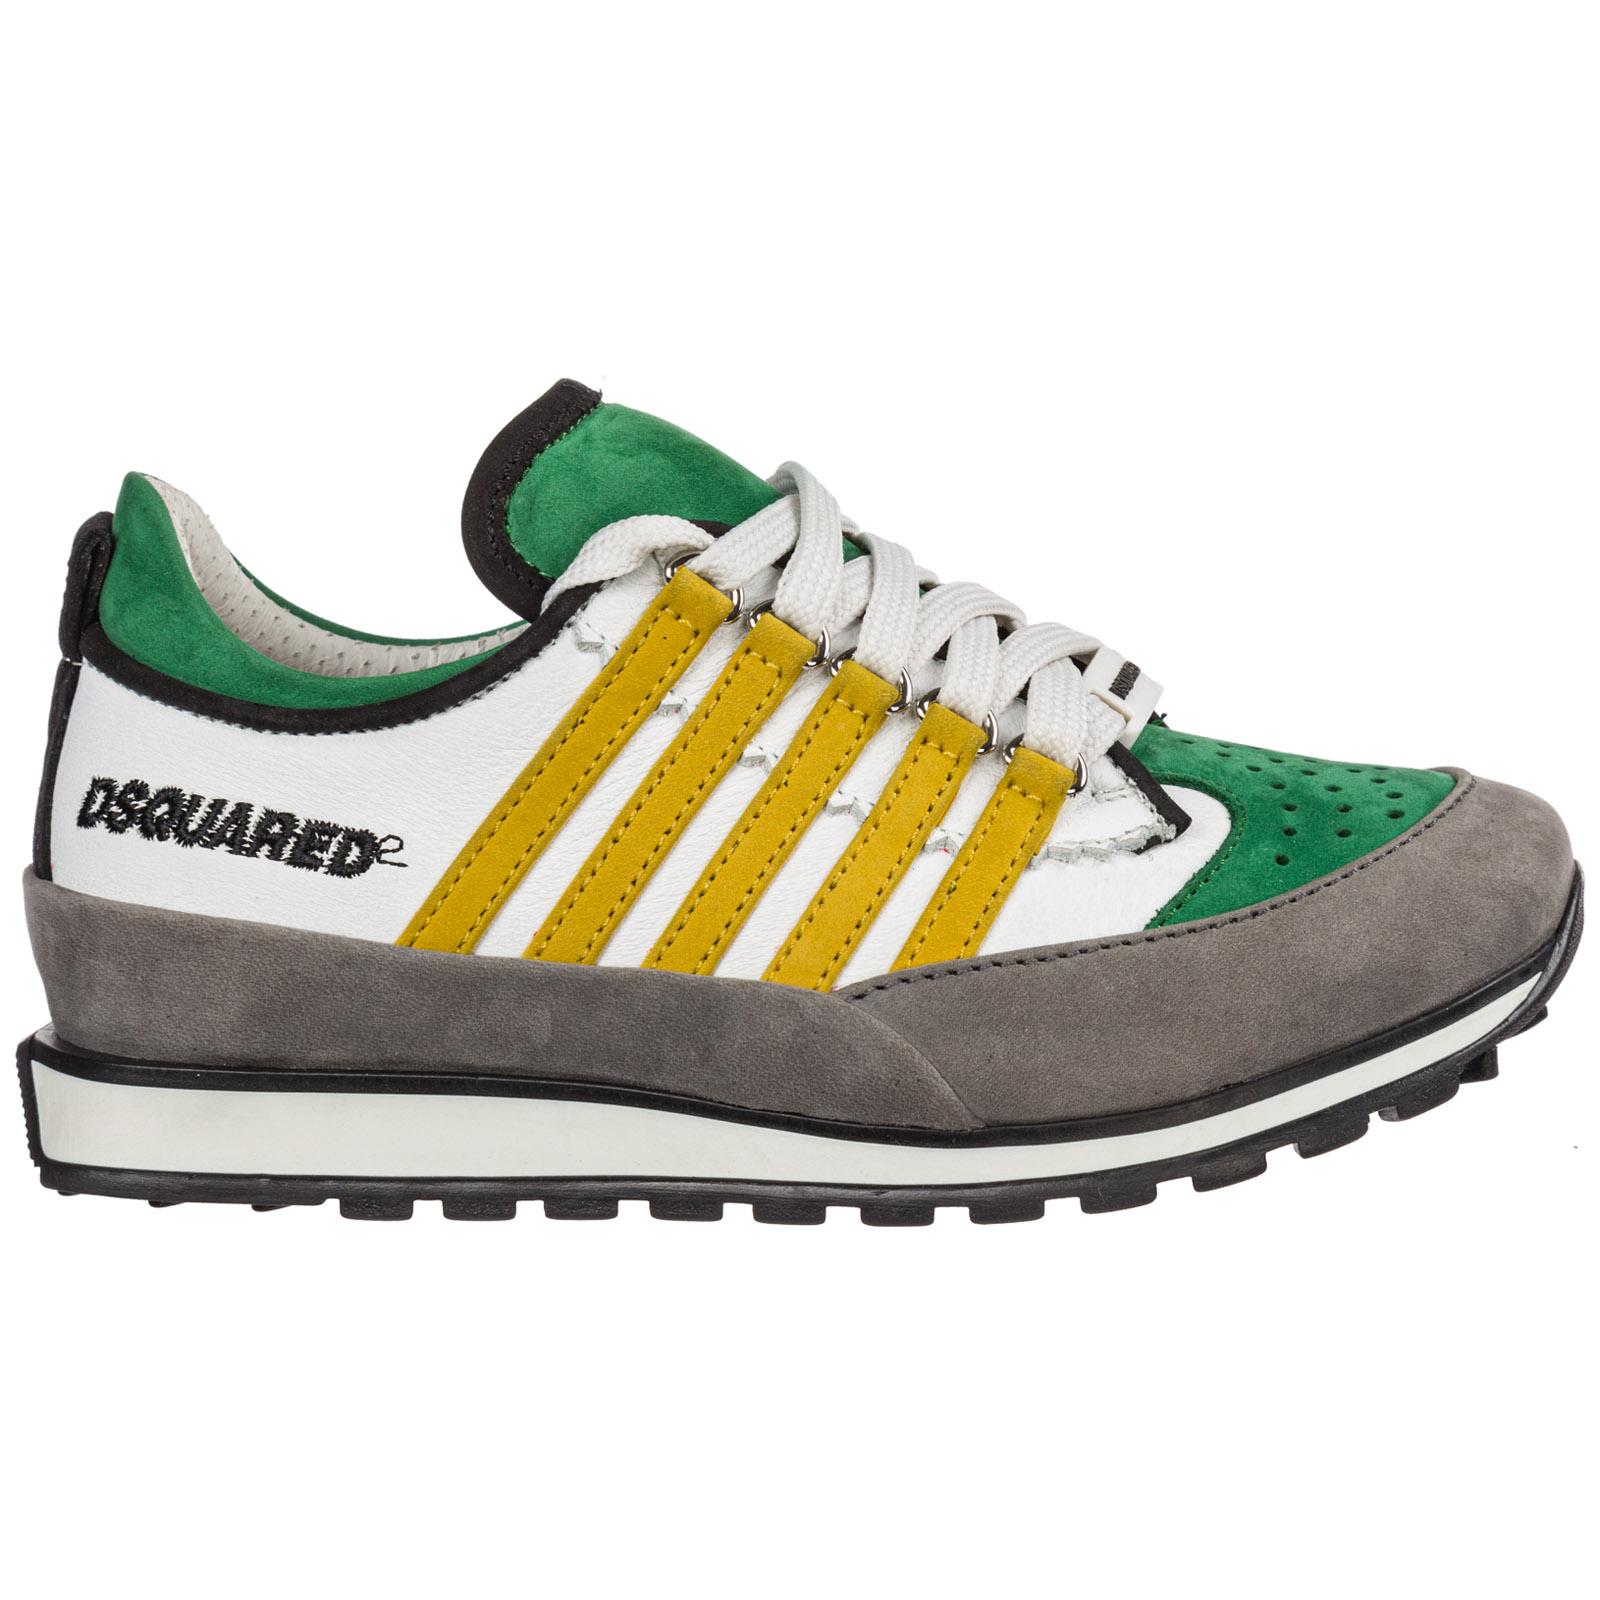 Scarpe Scarpe Sneakers Bambino Sneakers Pelle Bimbo Bambino Pelle Sneakers Bimbo Scarpe JTFclK13